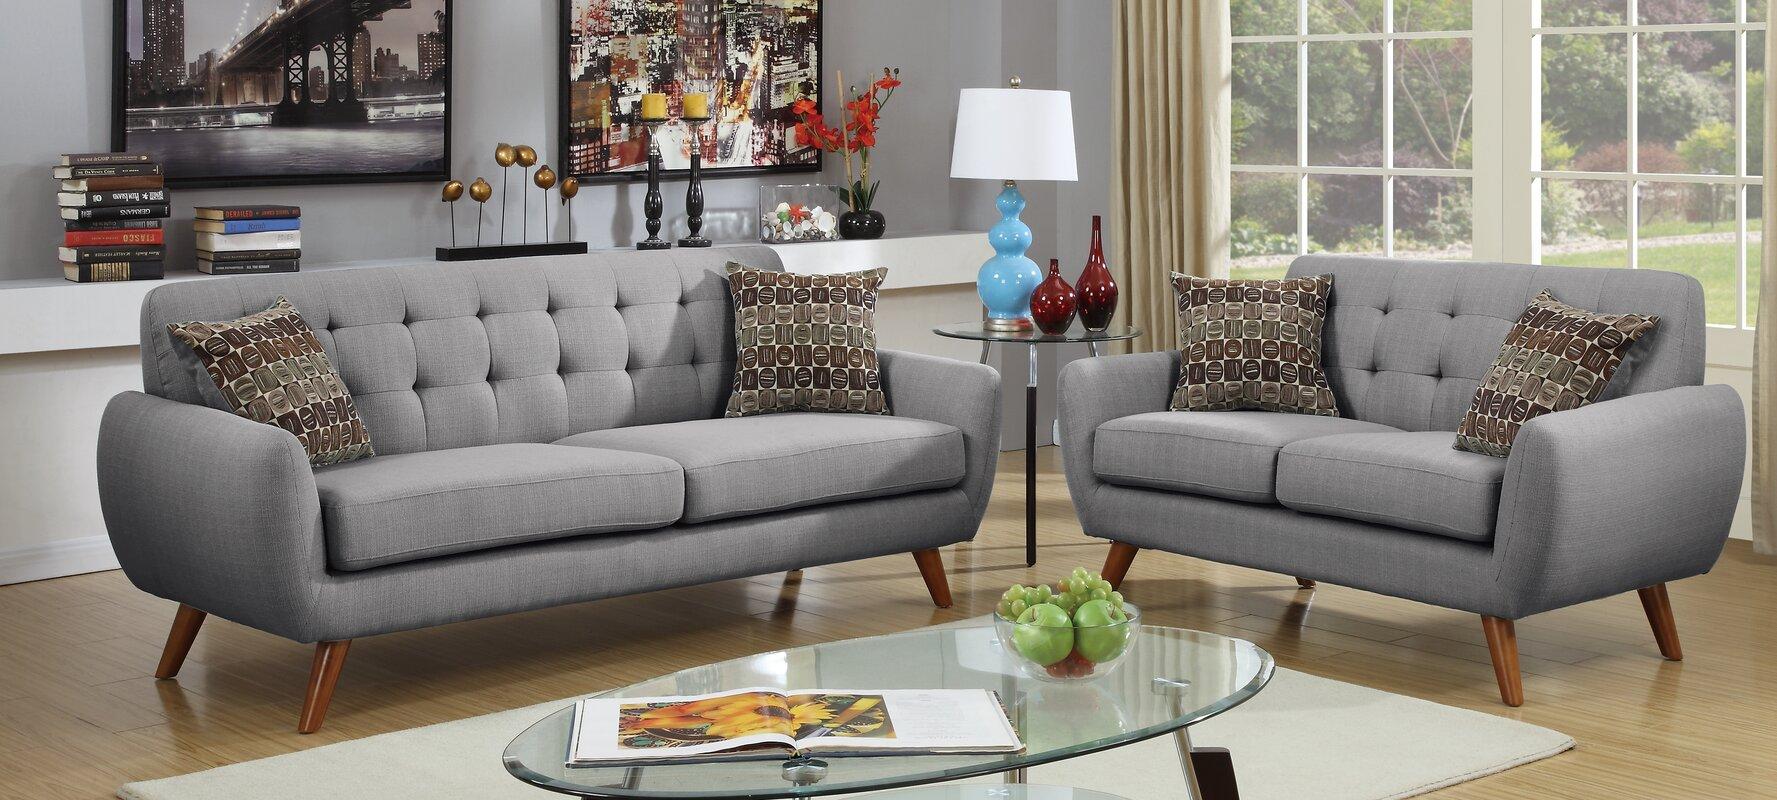 Langley Street Takeo 2 Piece Living Room Set & Reviews   Wayfair